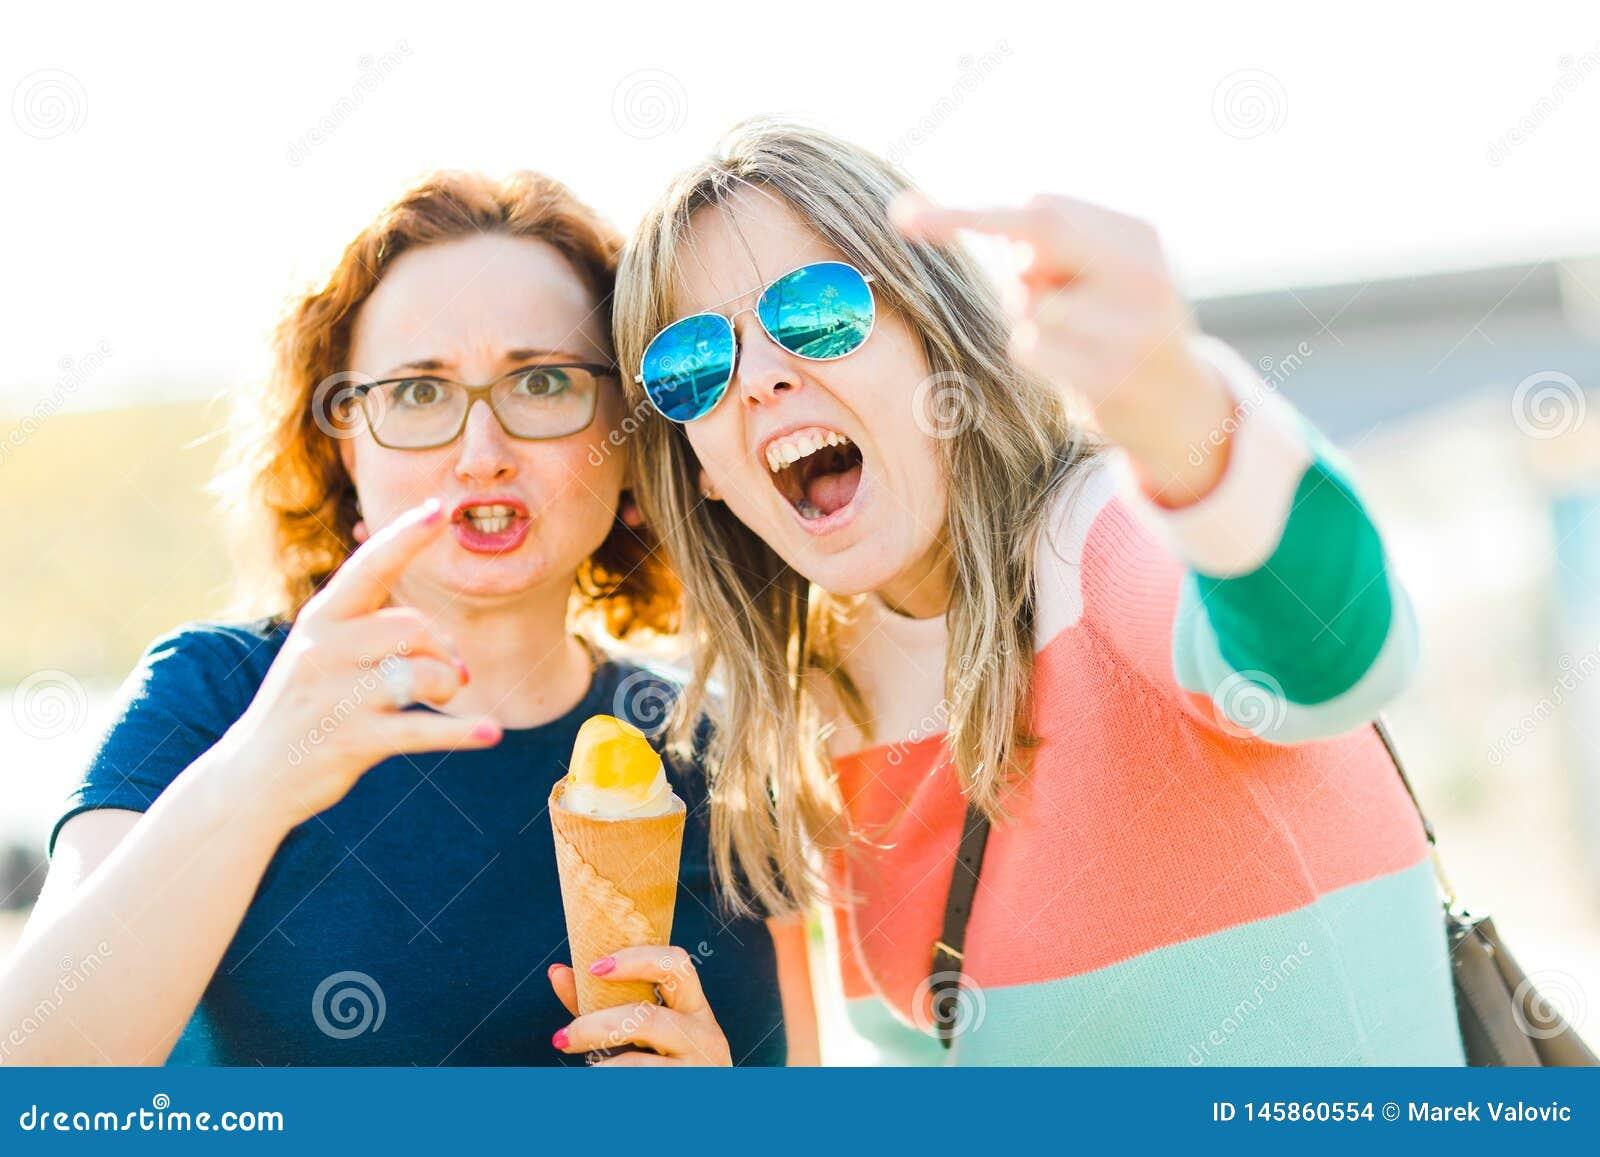 Duas mulheres irritadas que mostram gestos obscenos